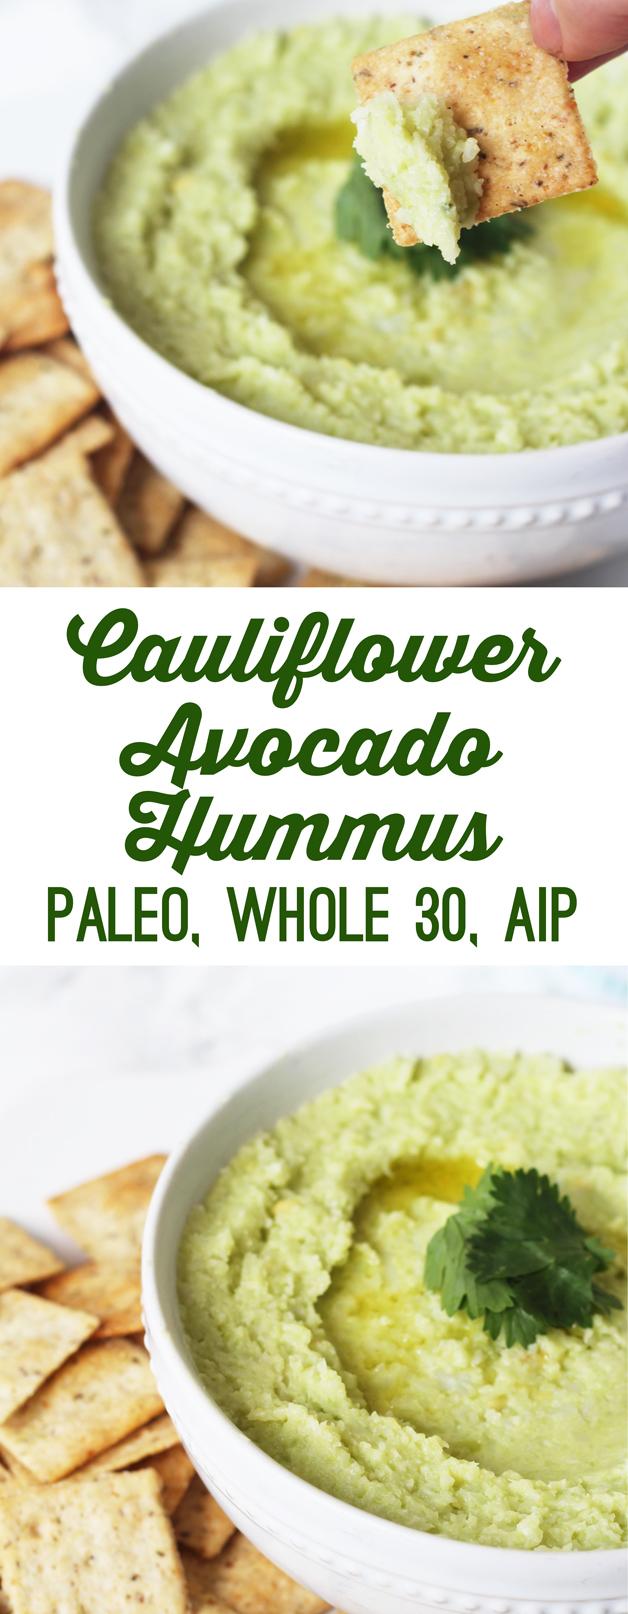 is hummus whole 30